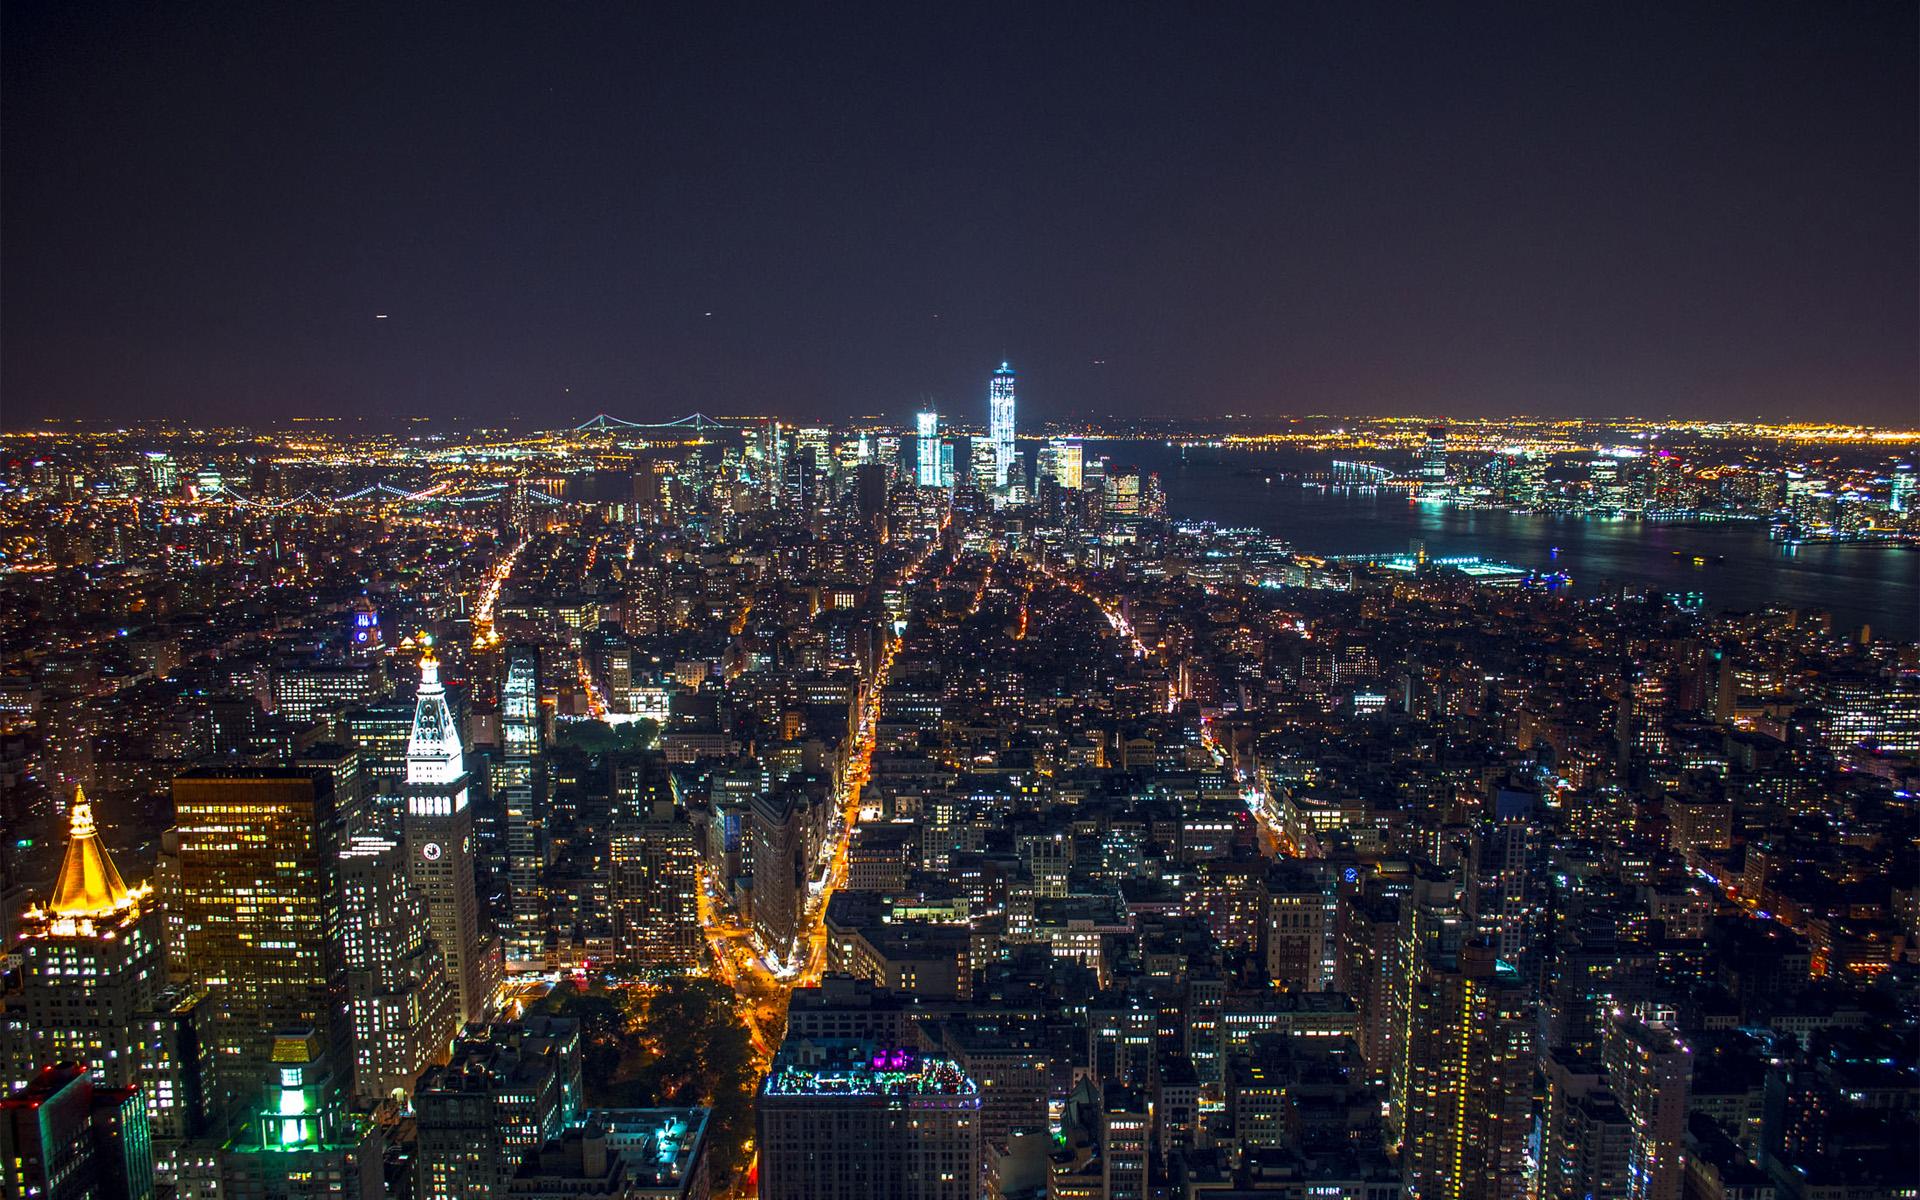 New York Manhattan At Night HD wallpaper Digitalhintnet 1920x1200